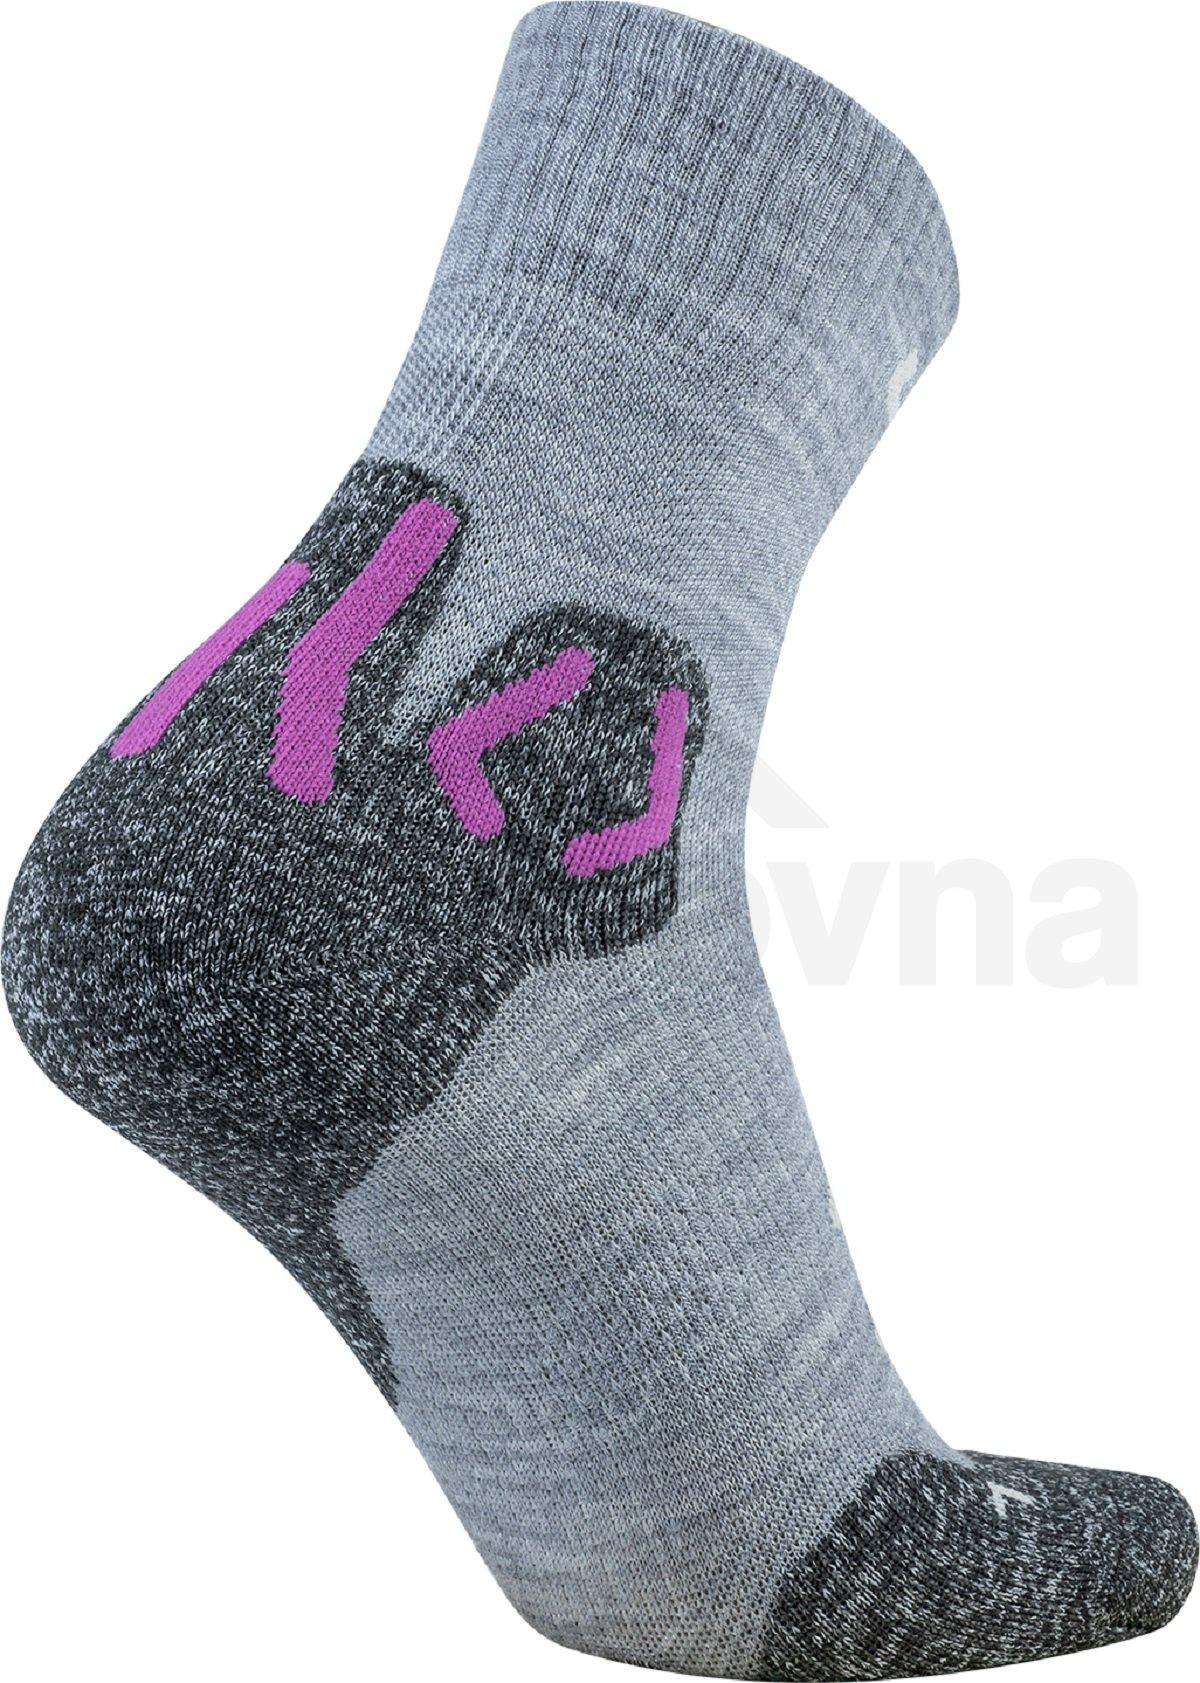 Dámské ponožky UYN Trekking Approach Merino Mid Socks W - šedá/růžová